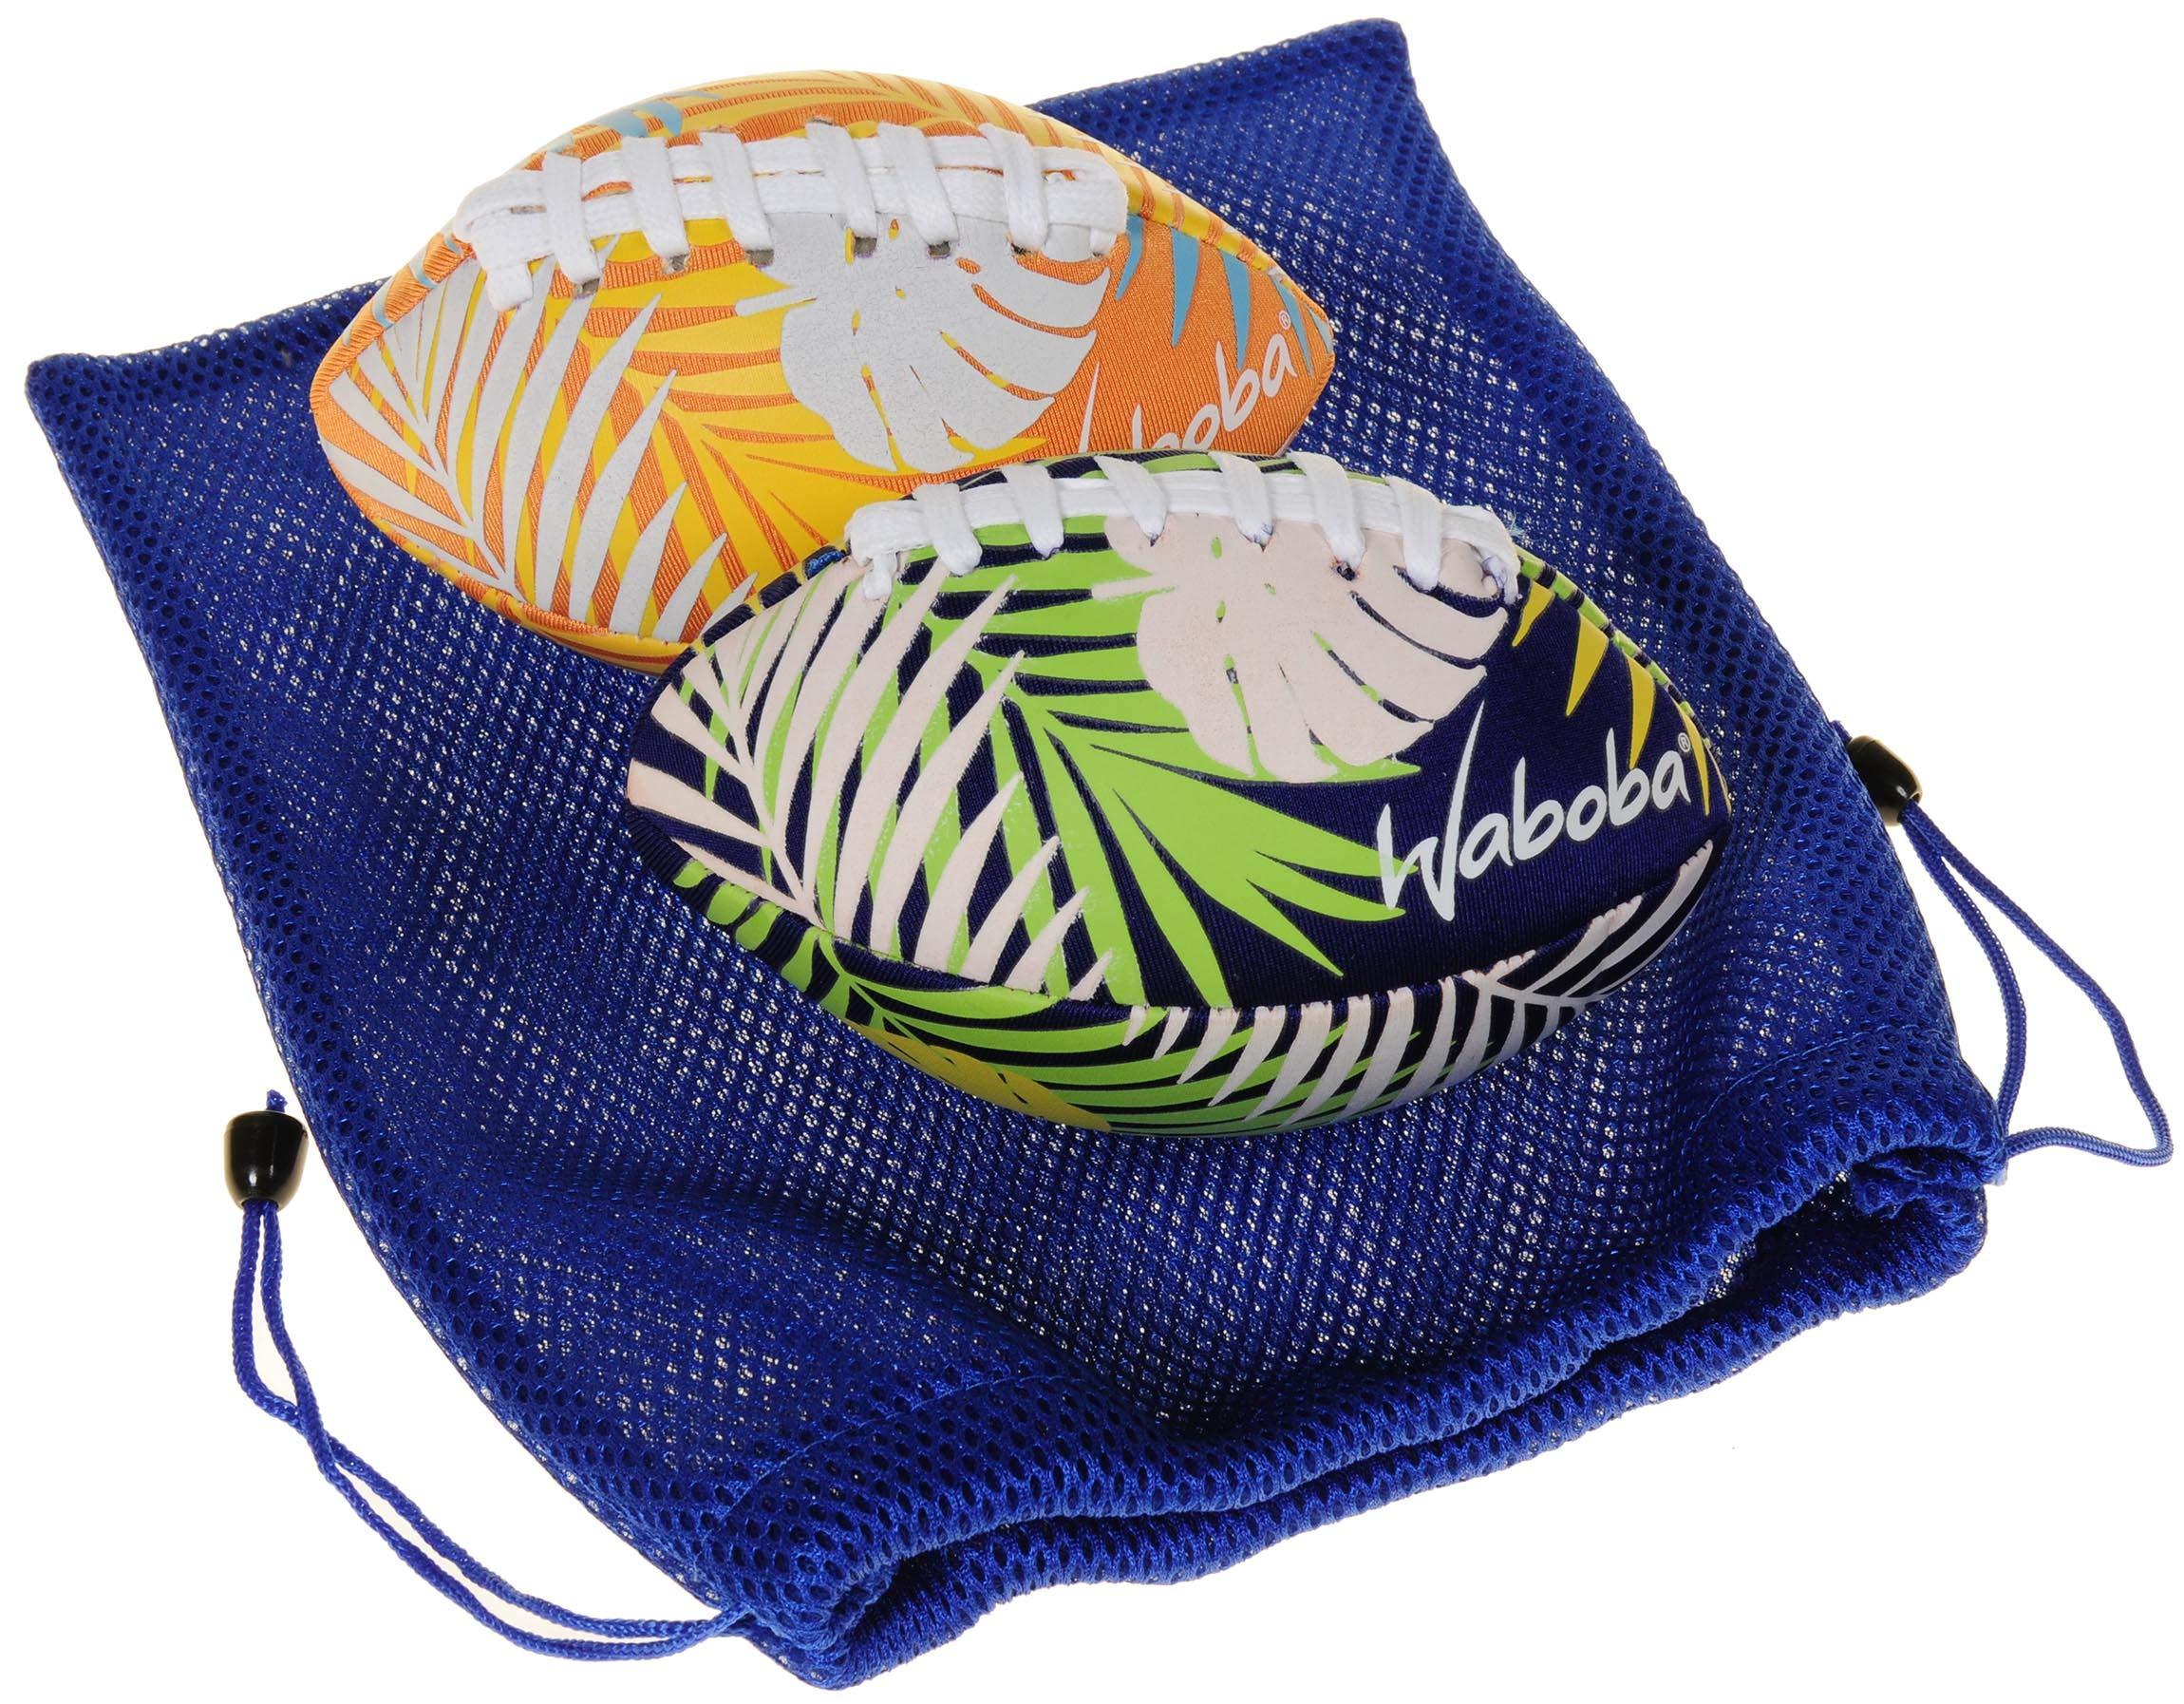 Waboba Color Changing Water Football 6'' // Bundle of 2 Footballs (Random Colors) // Bonus Blue Nylon Mesh Carry Bag// Bundled Items